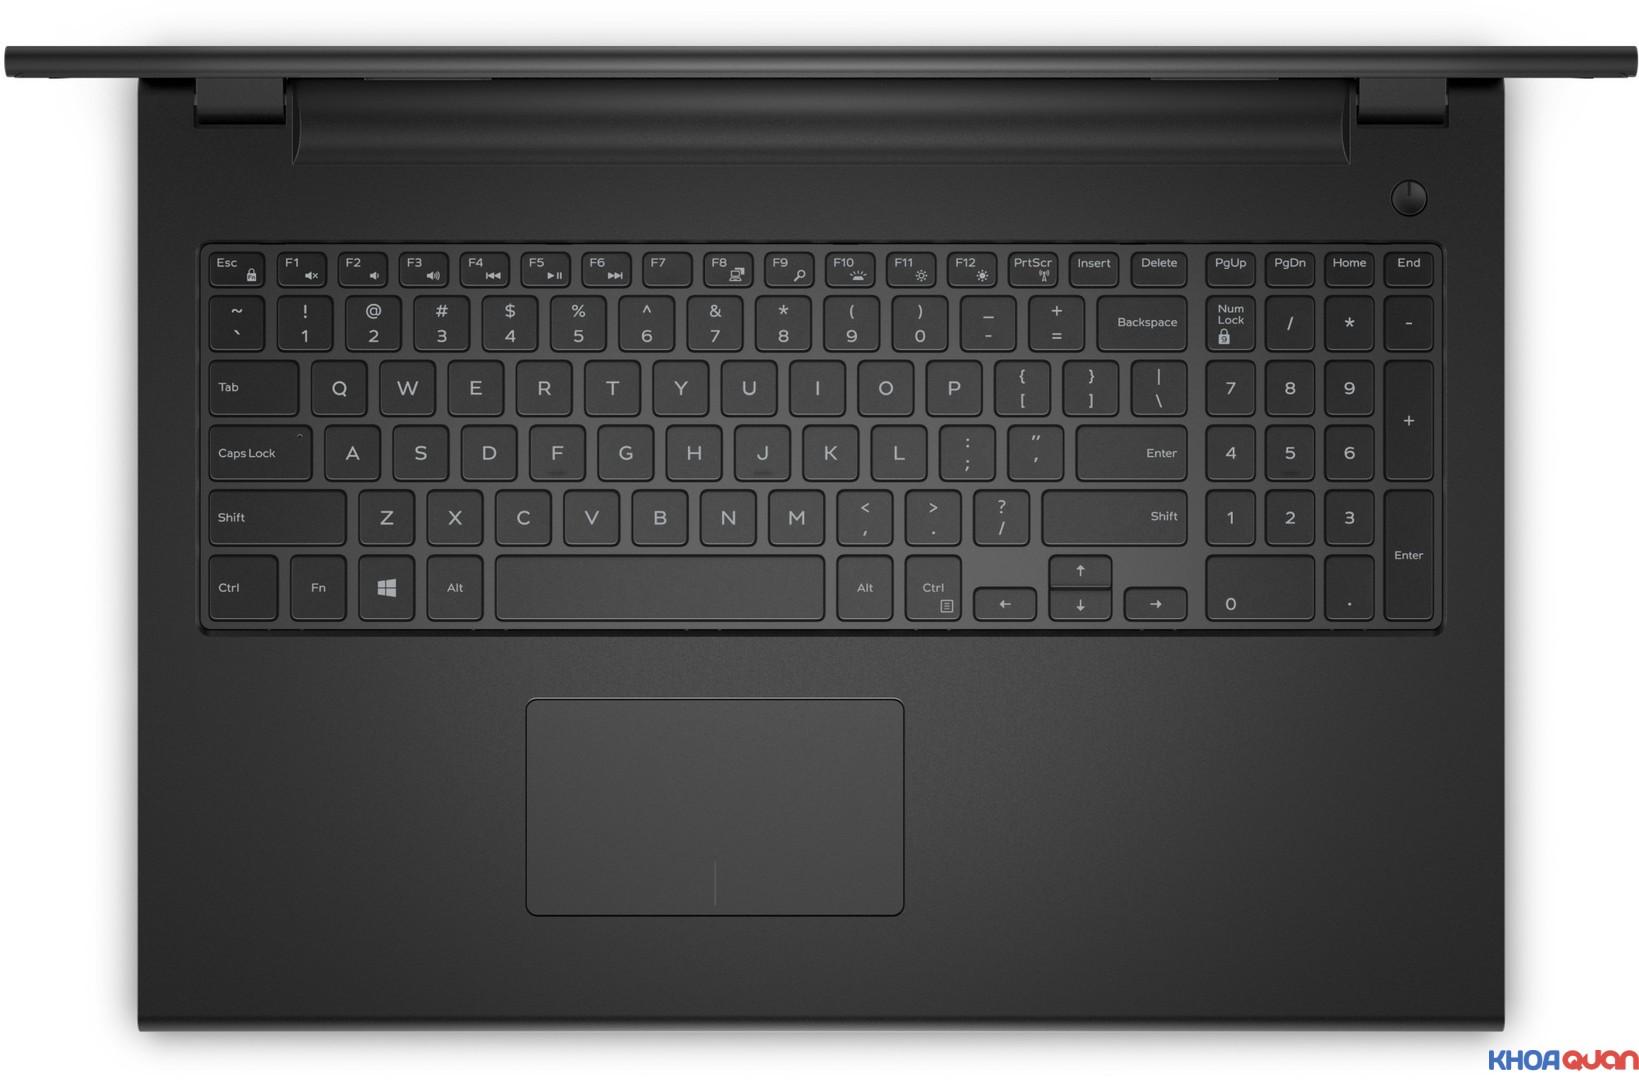 Dell Inspiron 3542 I5 15-4